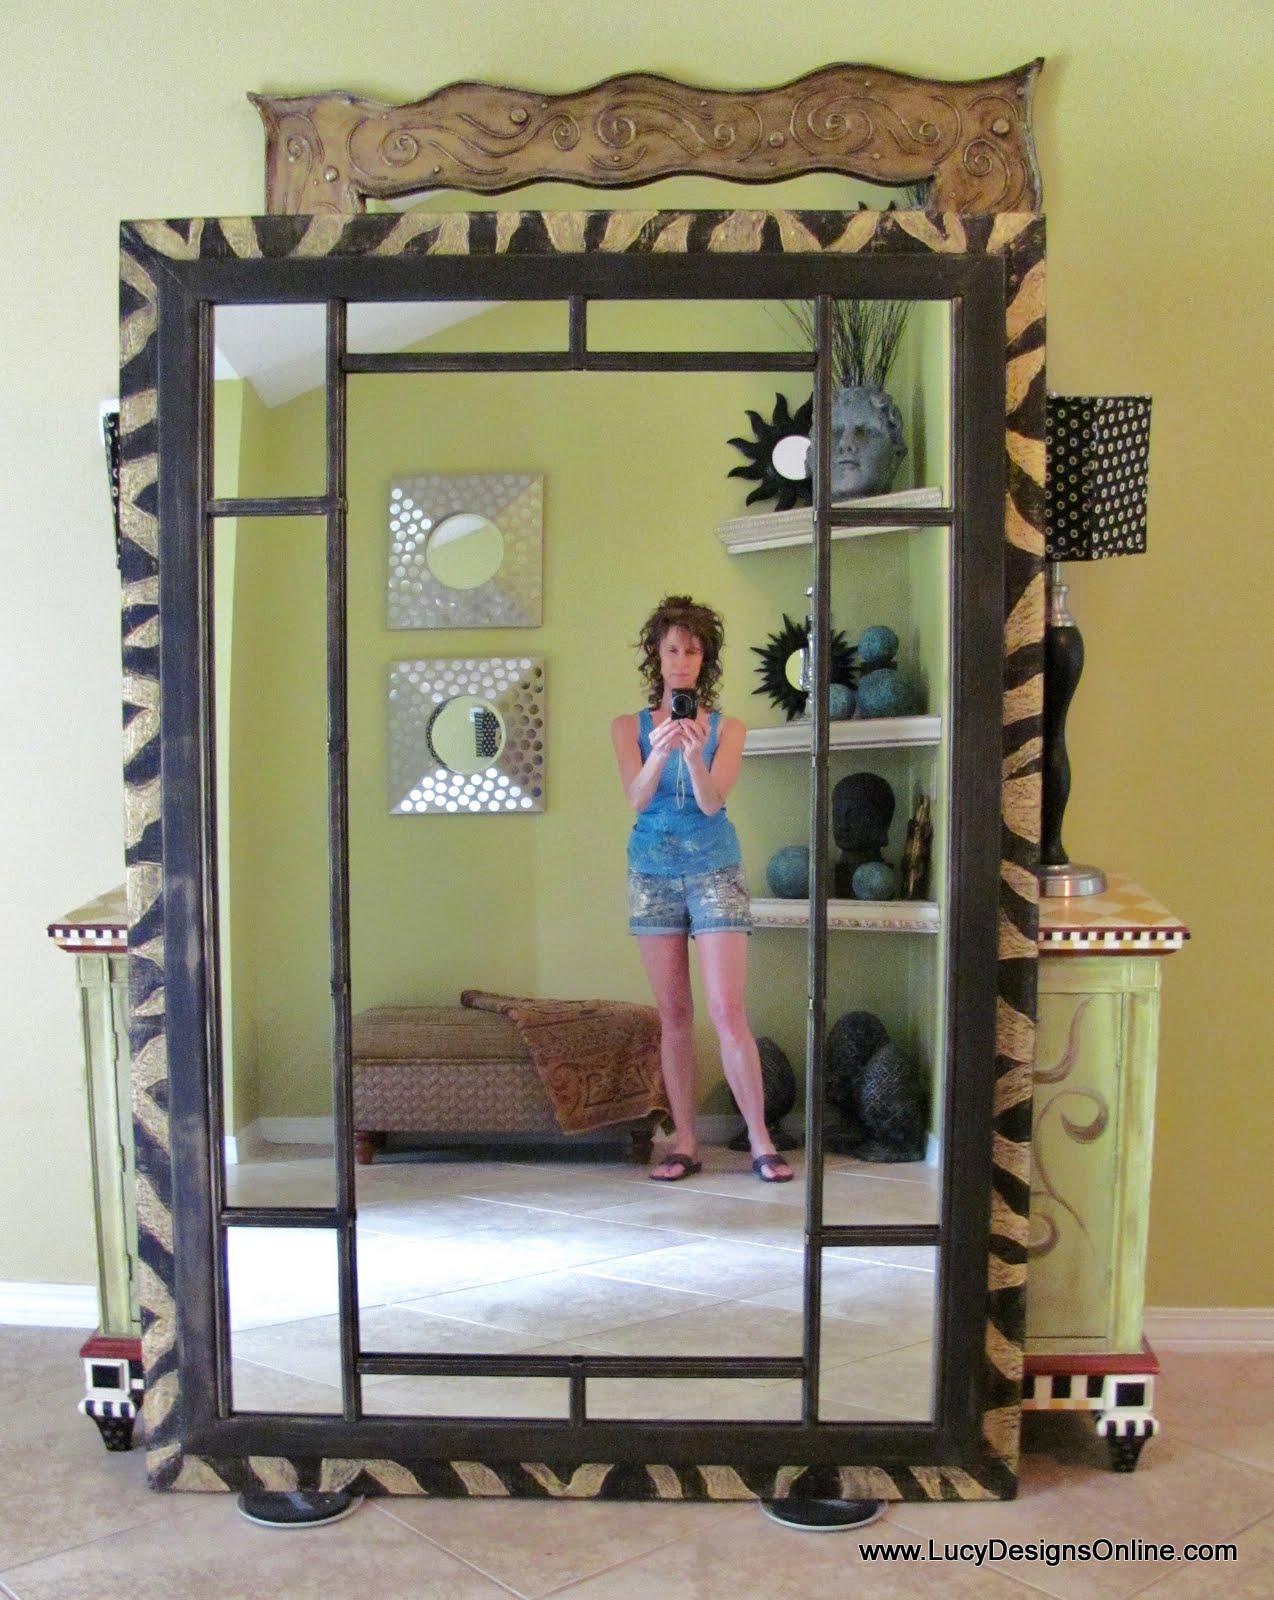 Dremel Carved Zebra Pattern On 6 Foot Wood Leaner Mirror